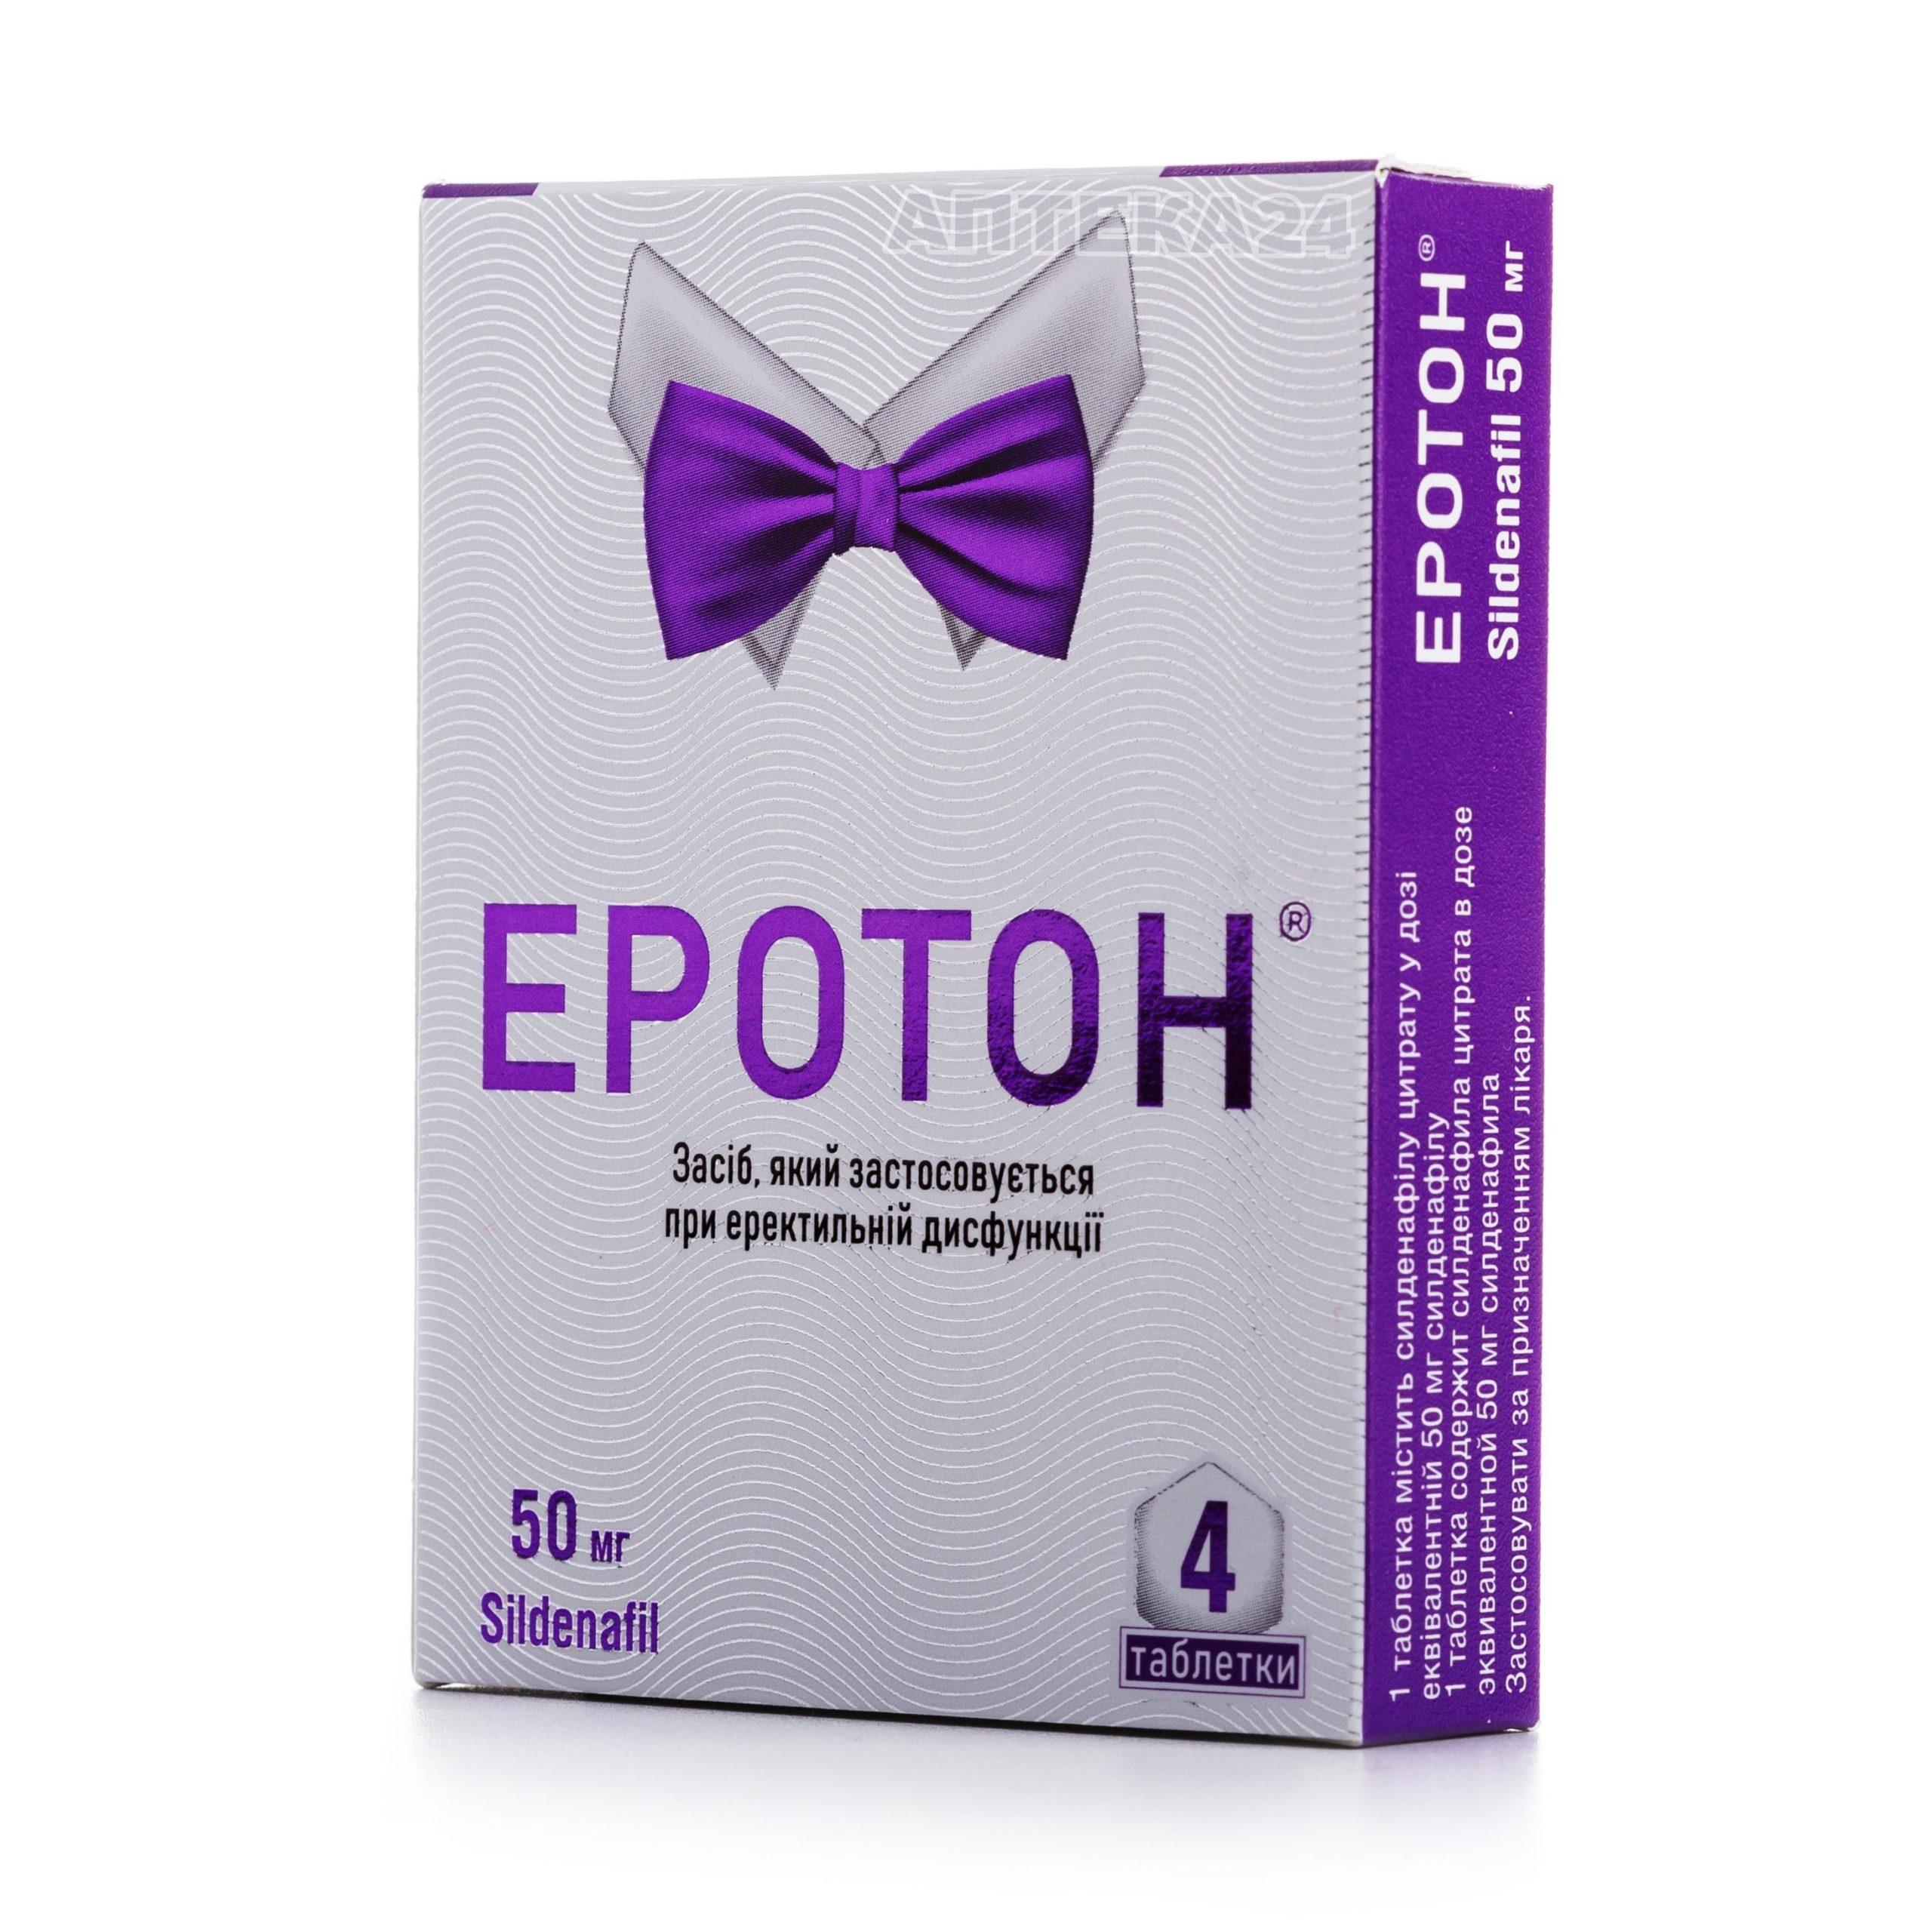 Эротон 50 мг N4 таблетки_600fd3151a4b8.jpeg